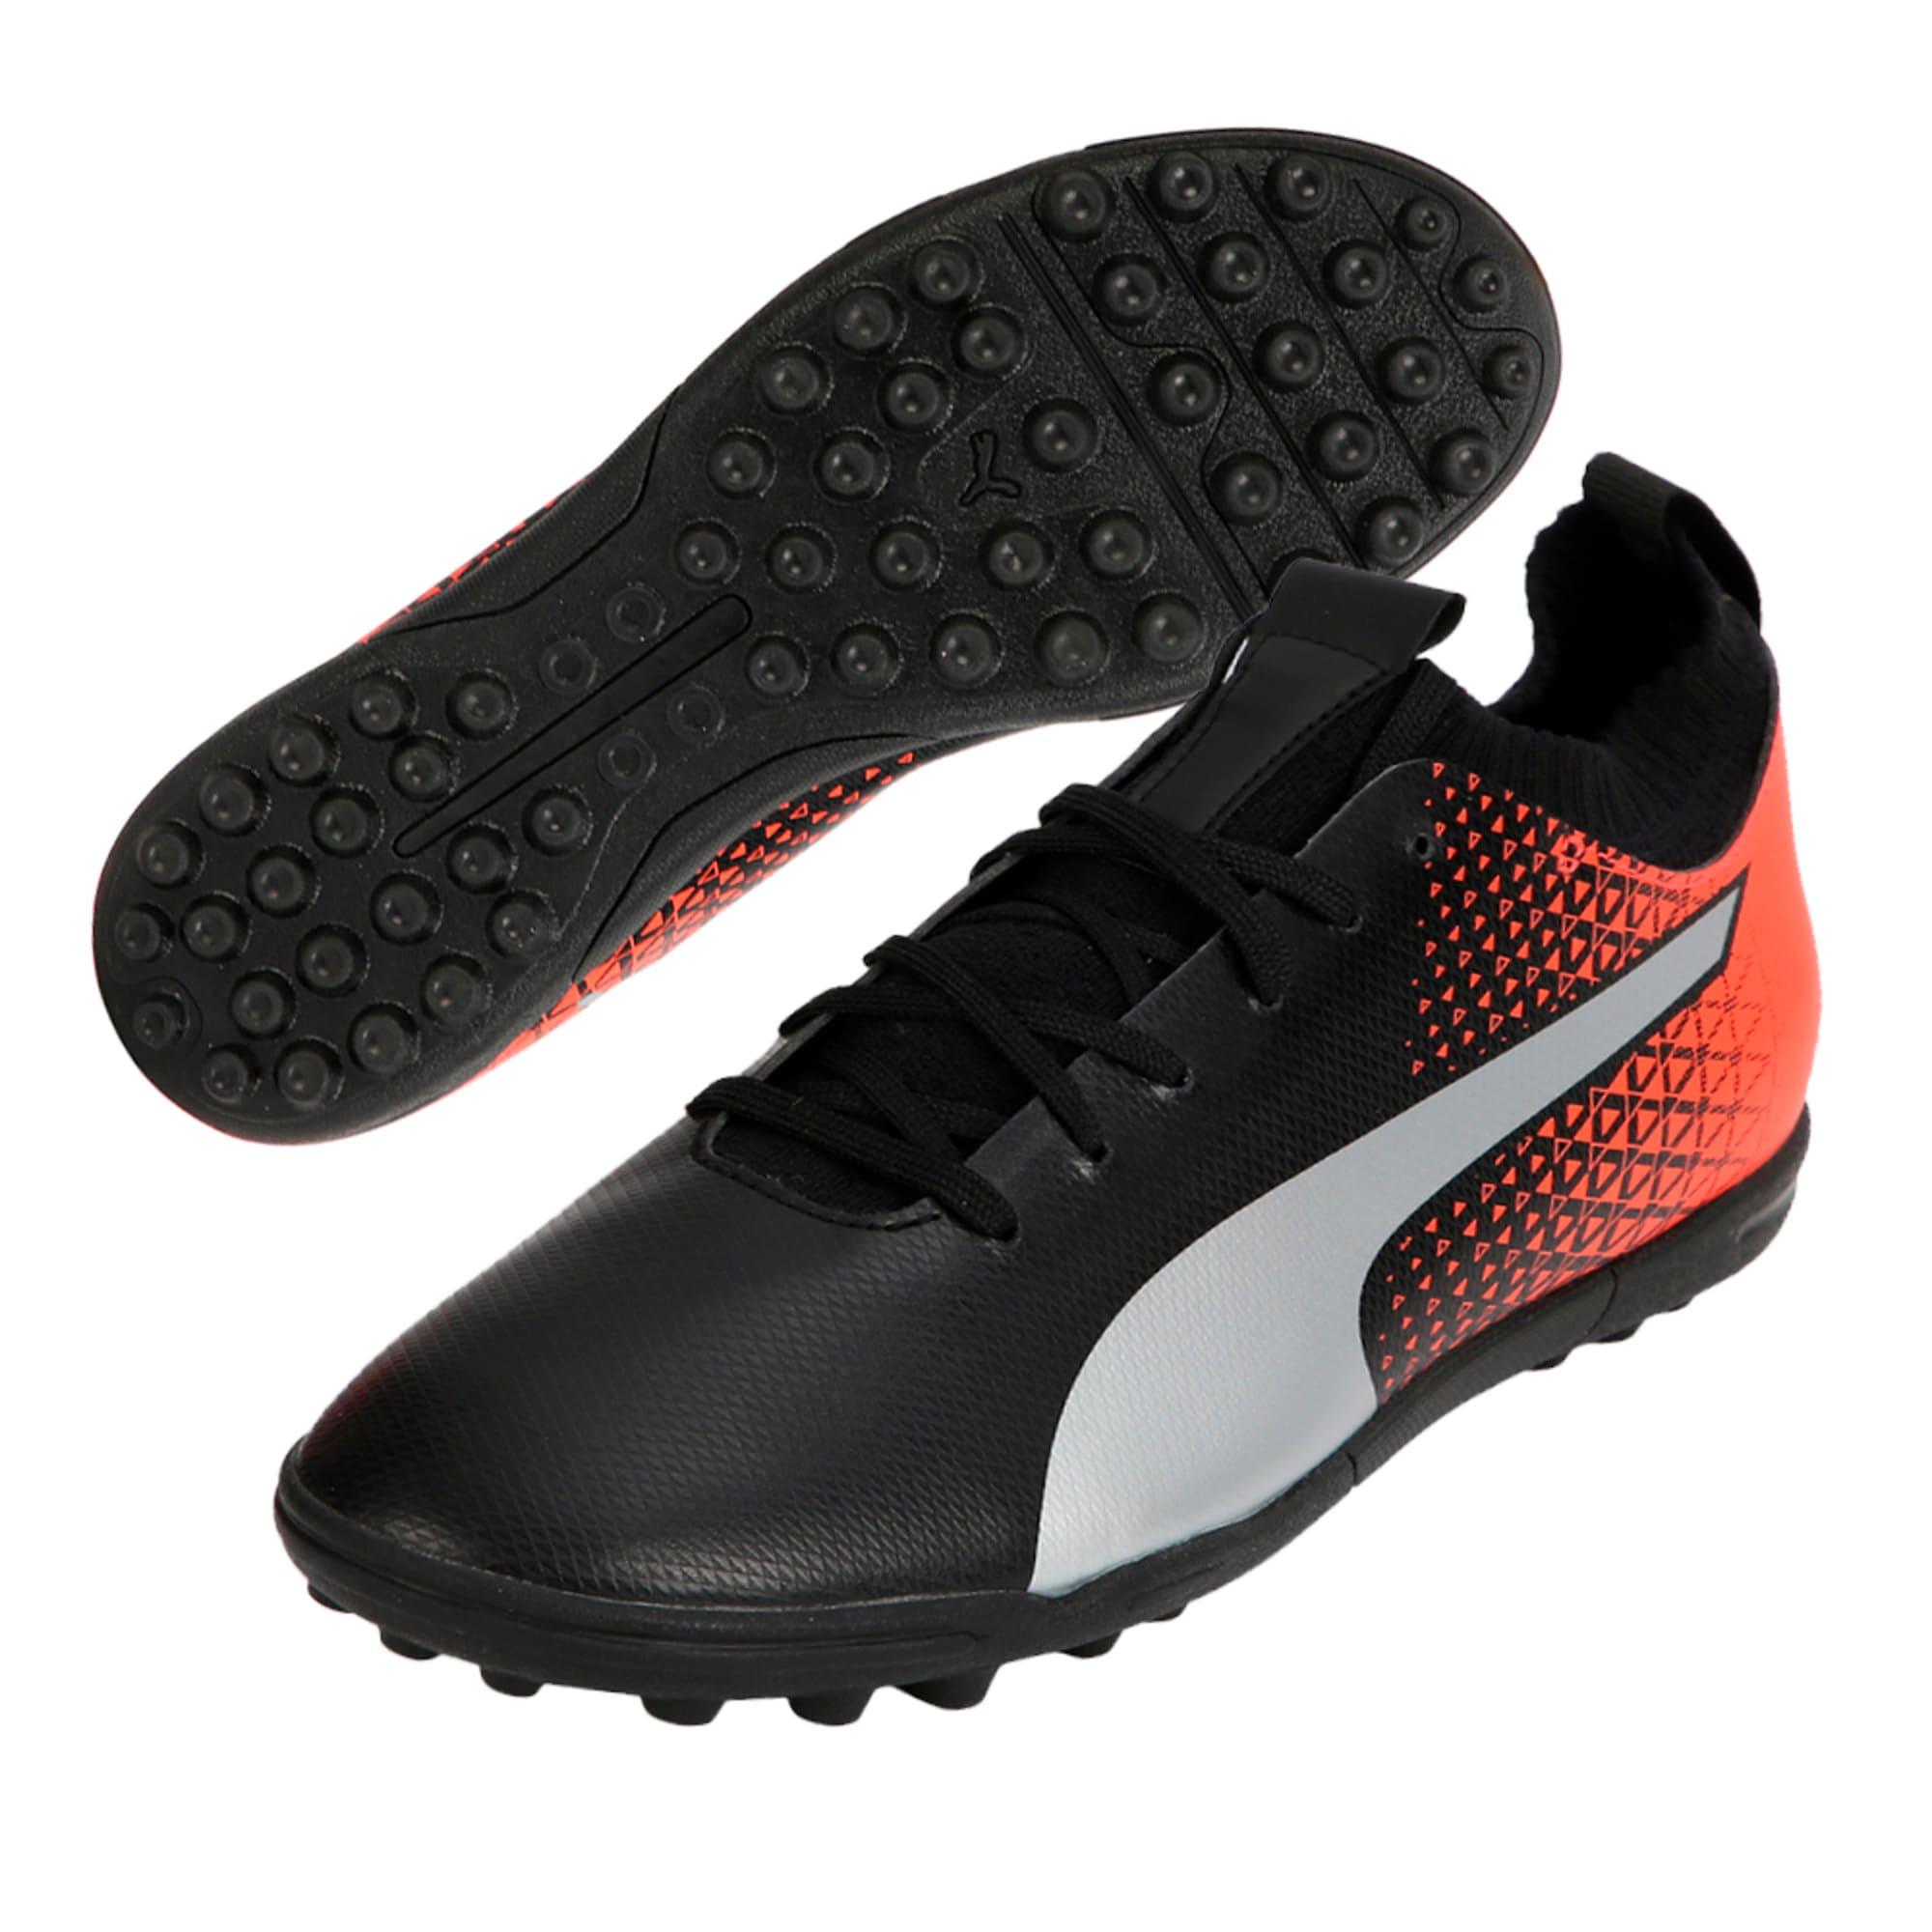 Thumbnail 2 of evoKNIT TT Men's Football Shoes, Black-Silver-Red, medium-IND